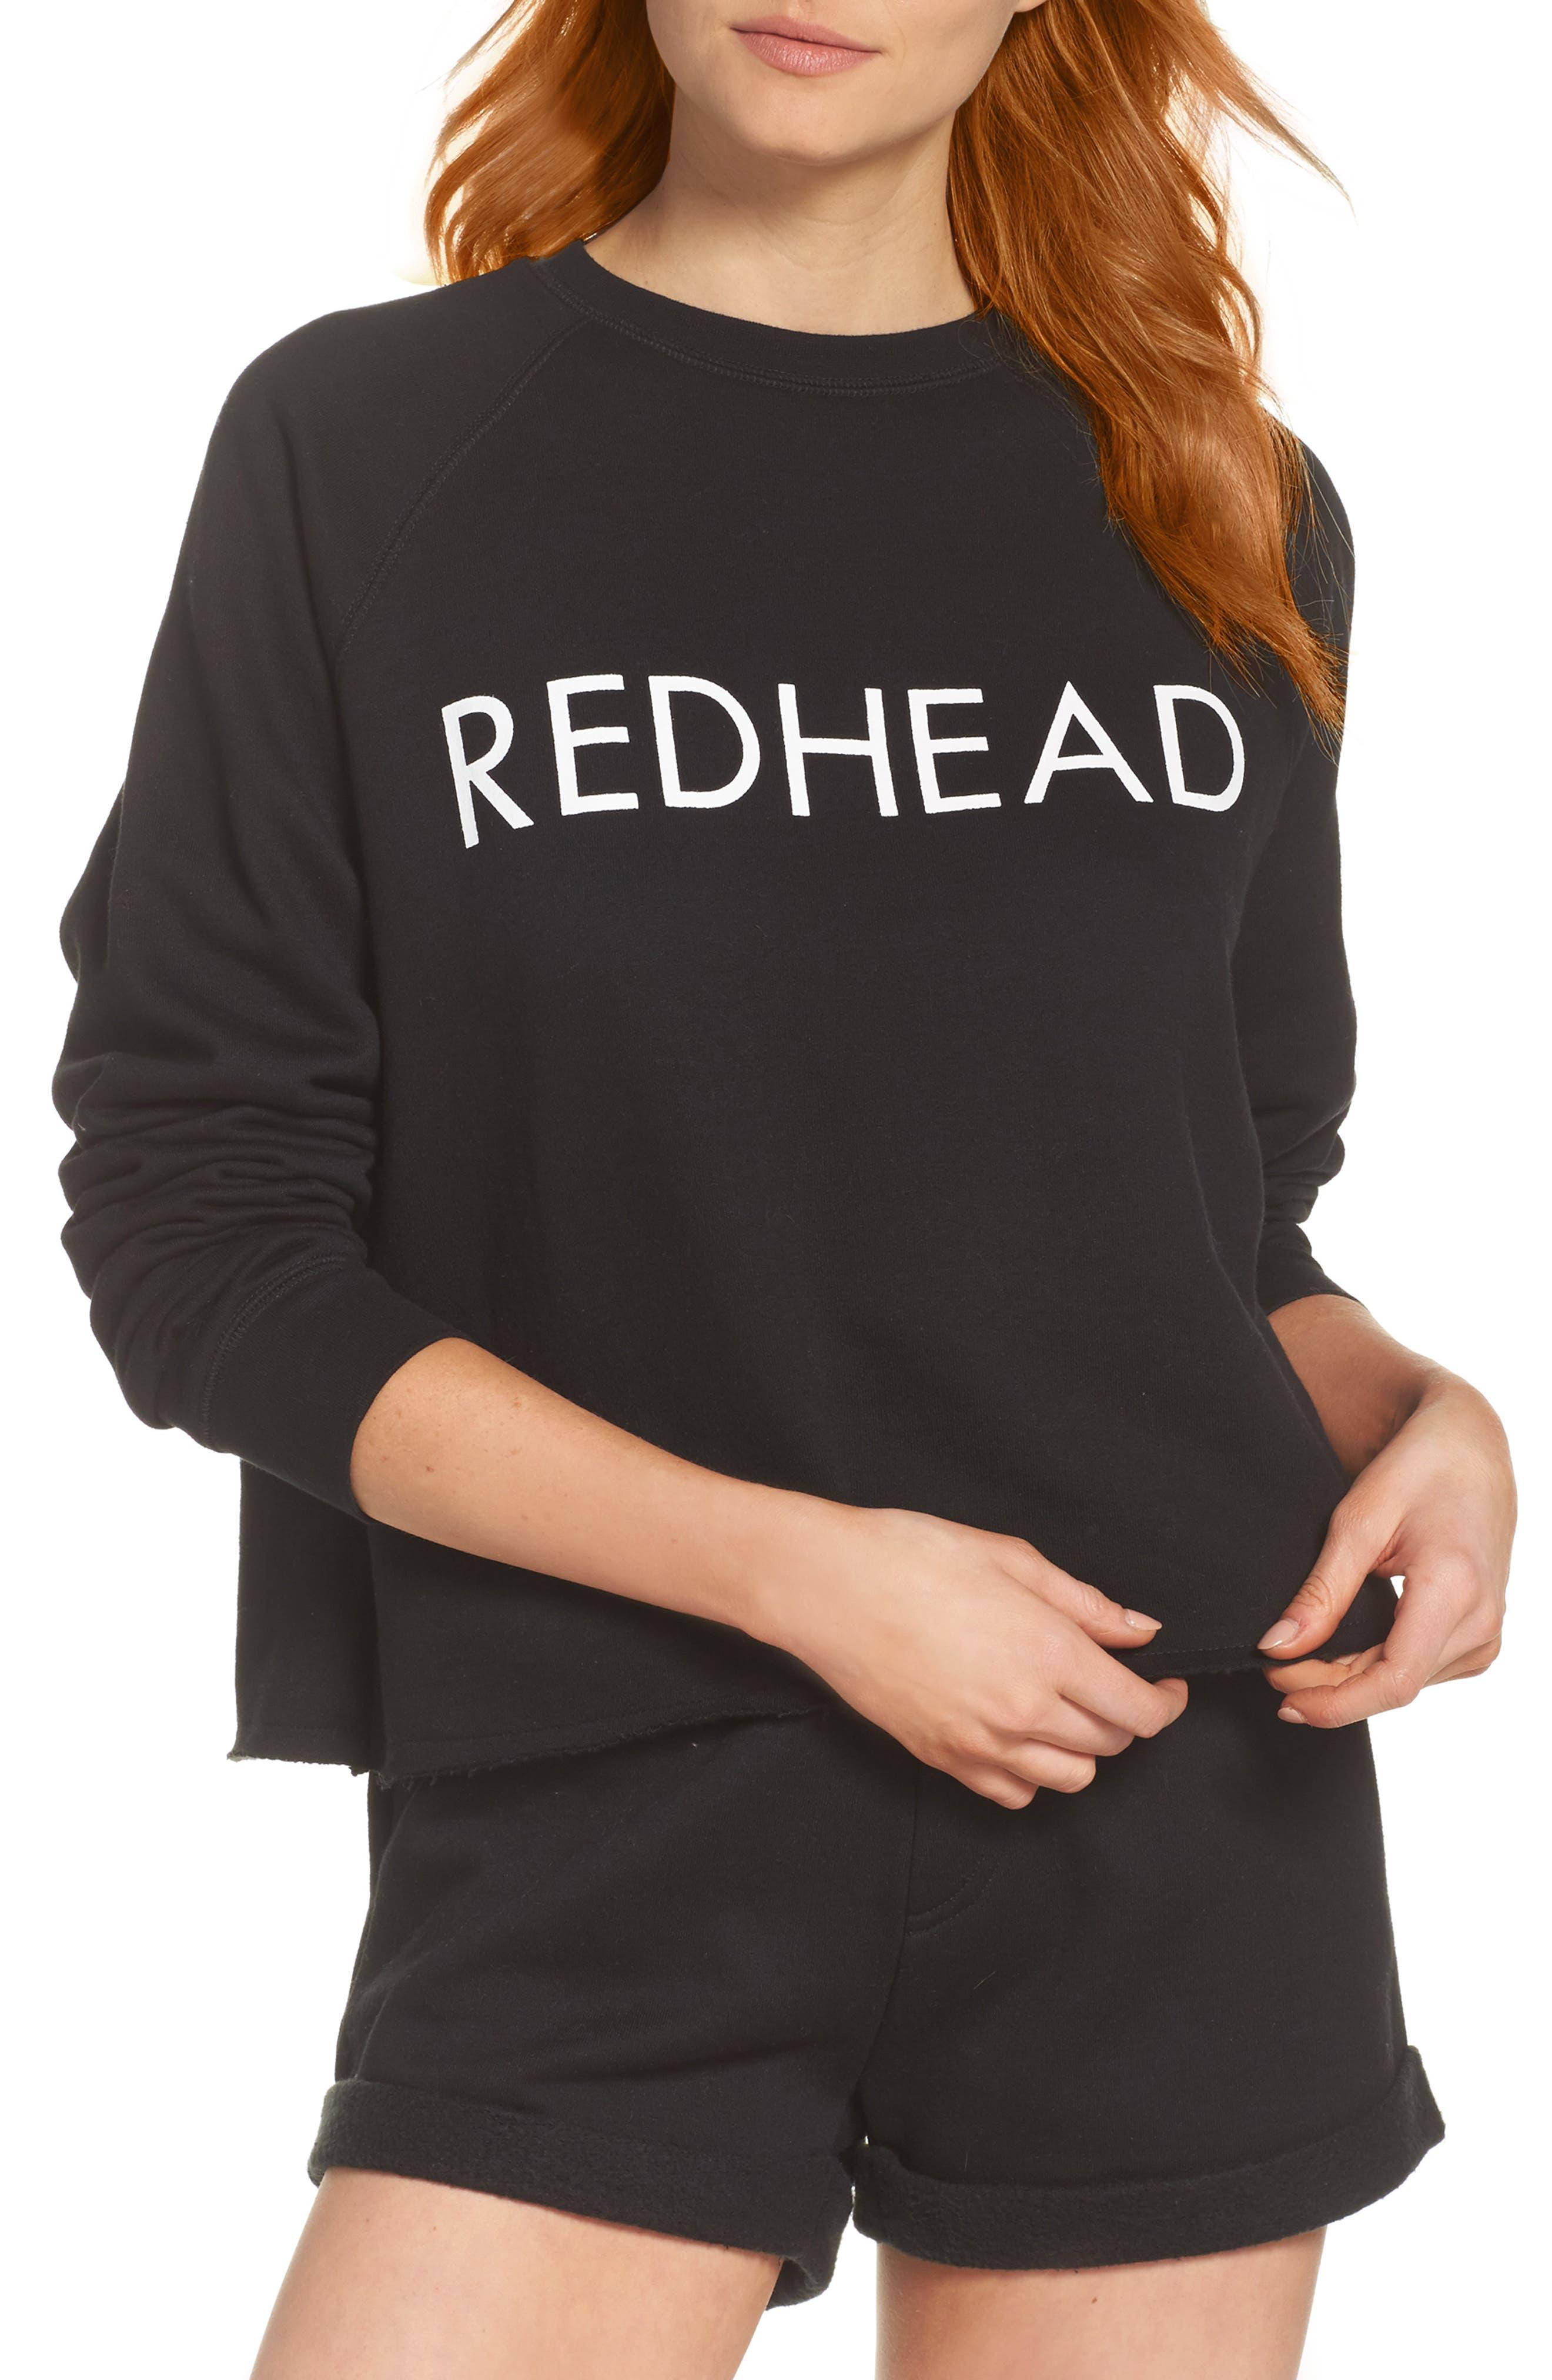 Redhead Raw Hem Sweatshirt,                             Main thumbnail 1, color,                             Black